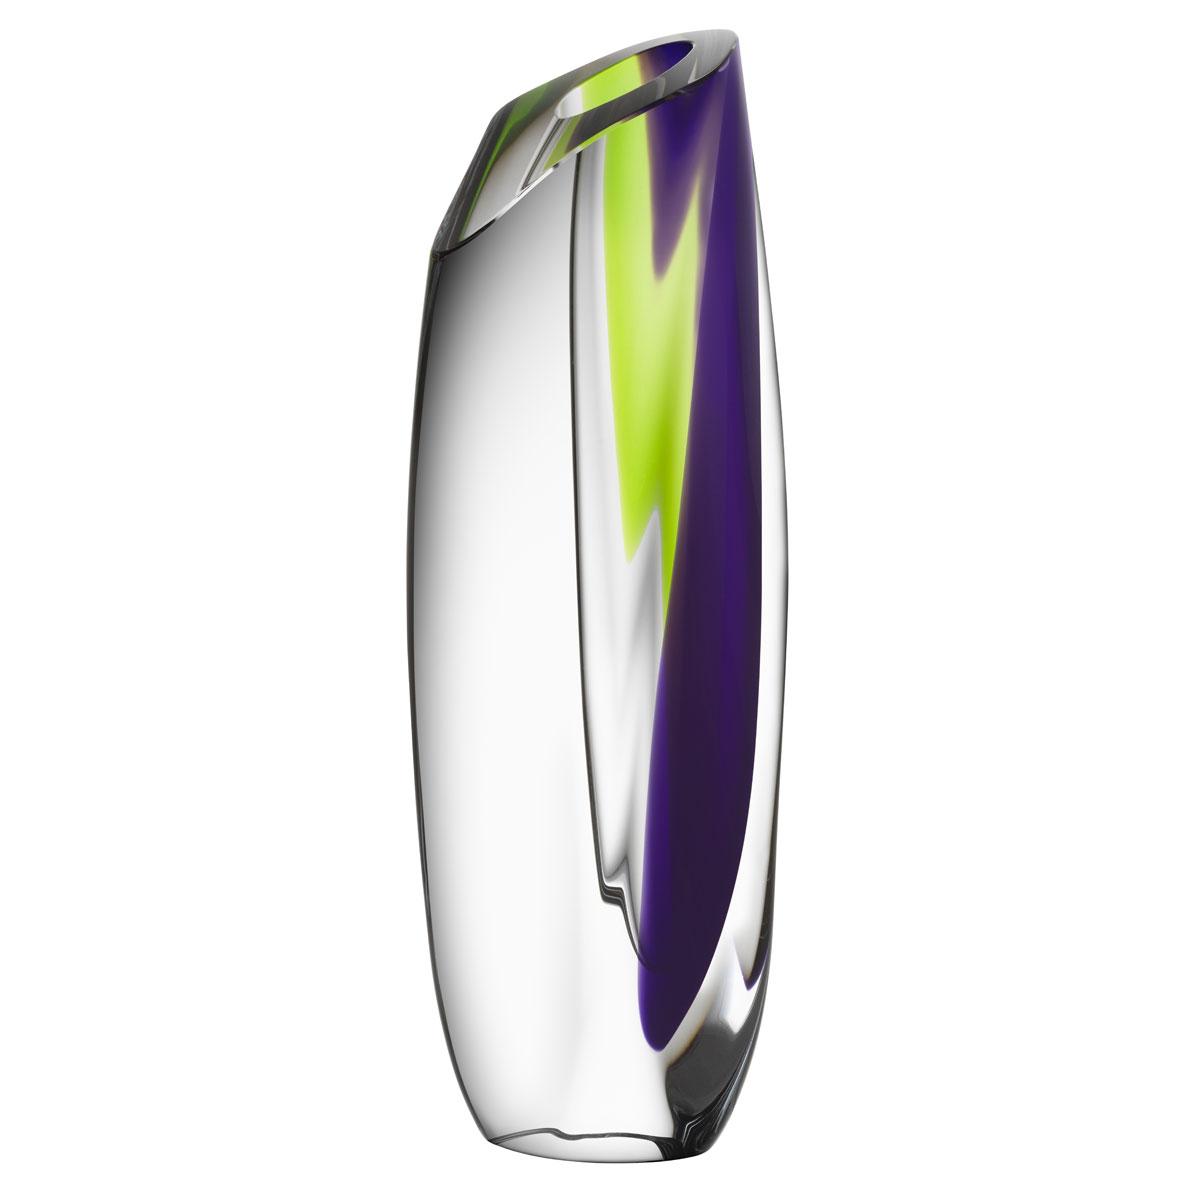 Kosta Boda Saraband Vase Purple, Green